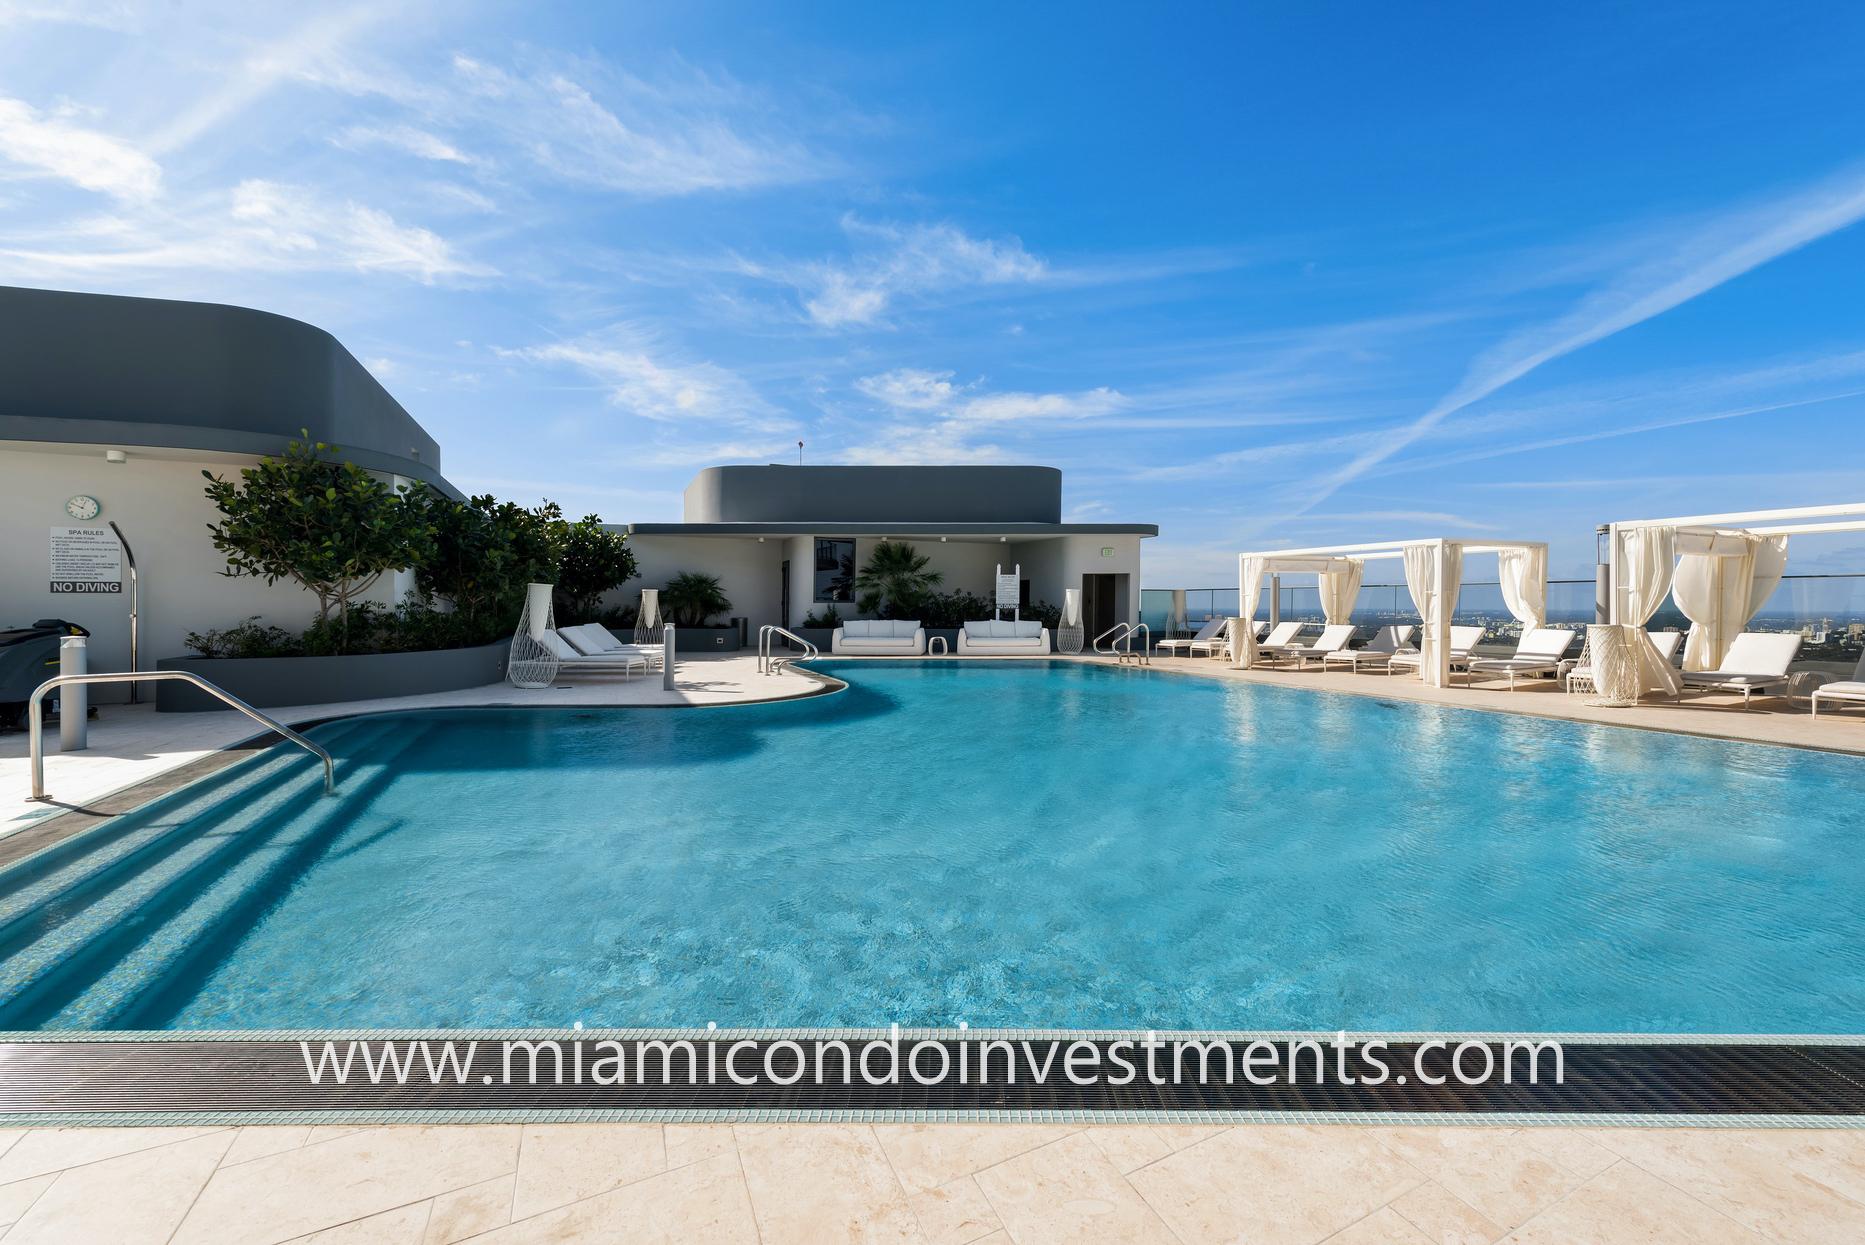 Brickell Flatiron rooftop pool and cabanas